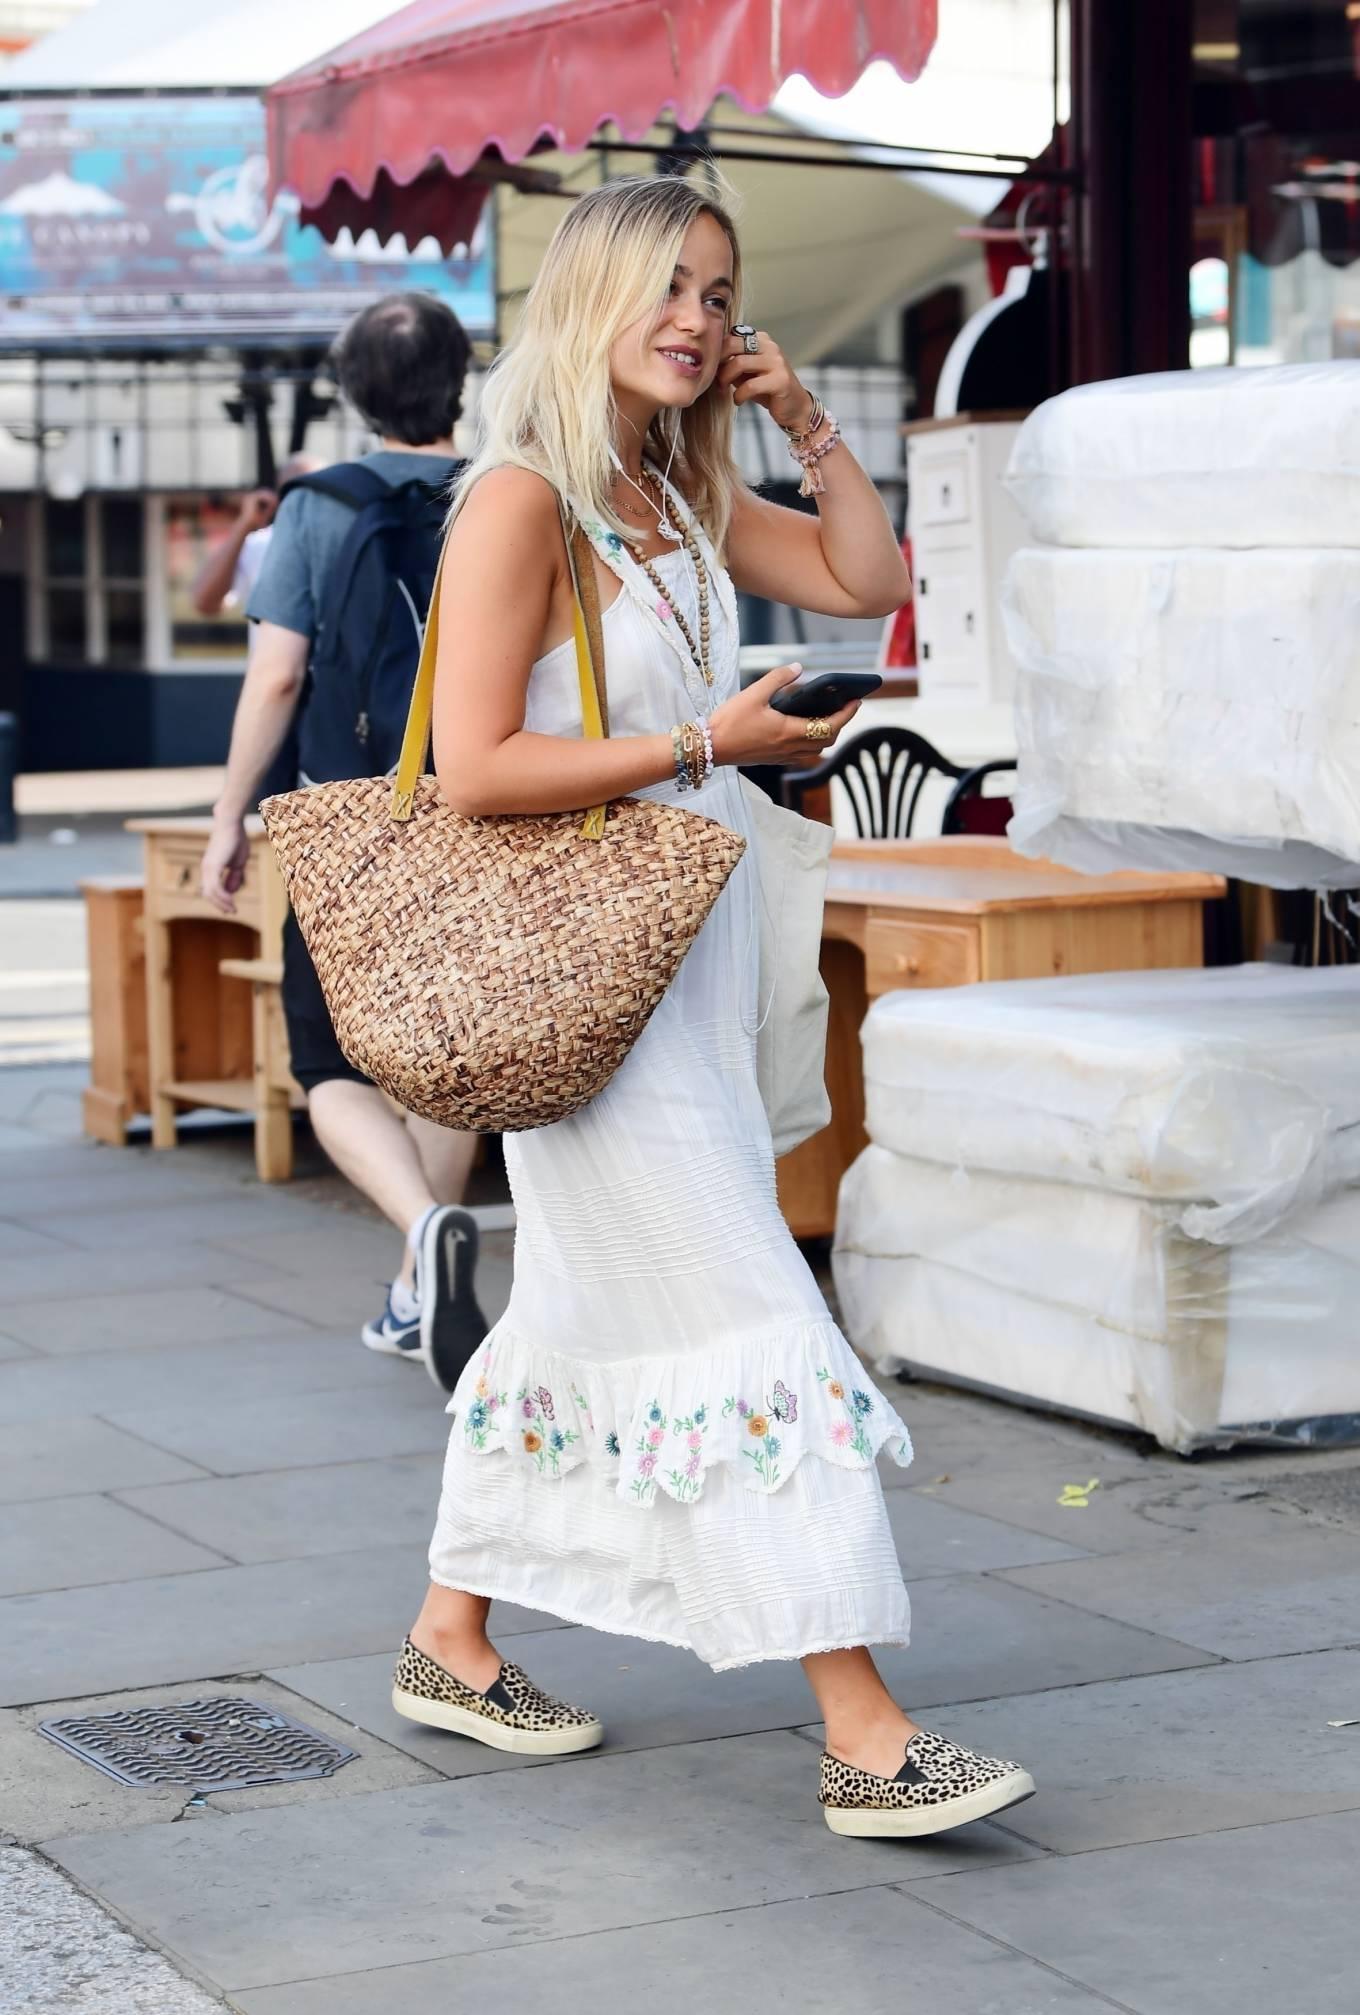 Amelia Windsor 2020 : Amelia Windsor – Looks stunning in a white summery dress in London-11